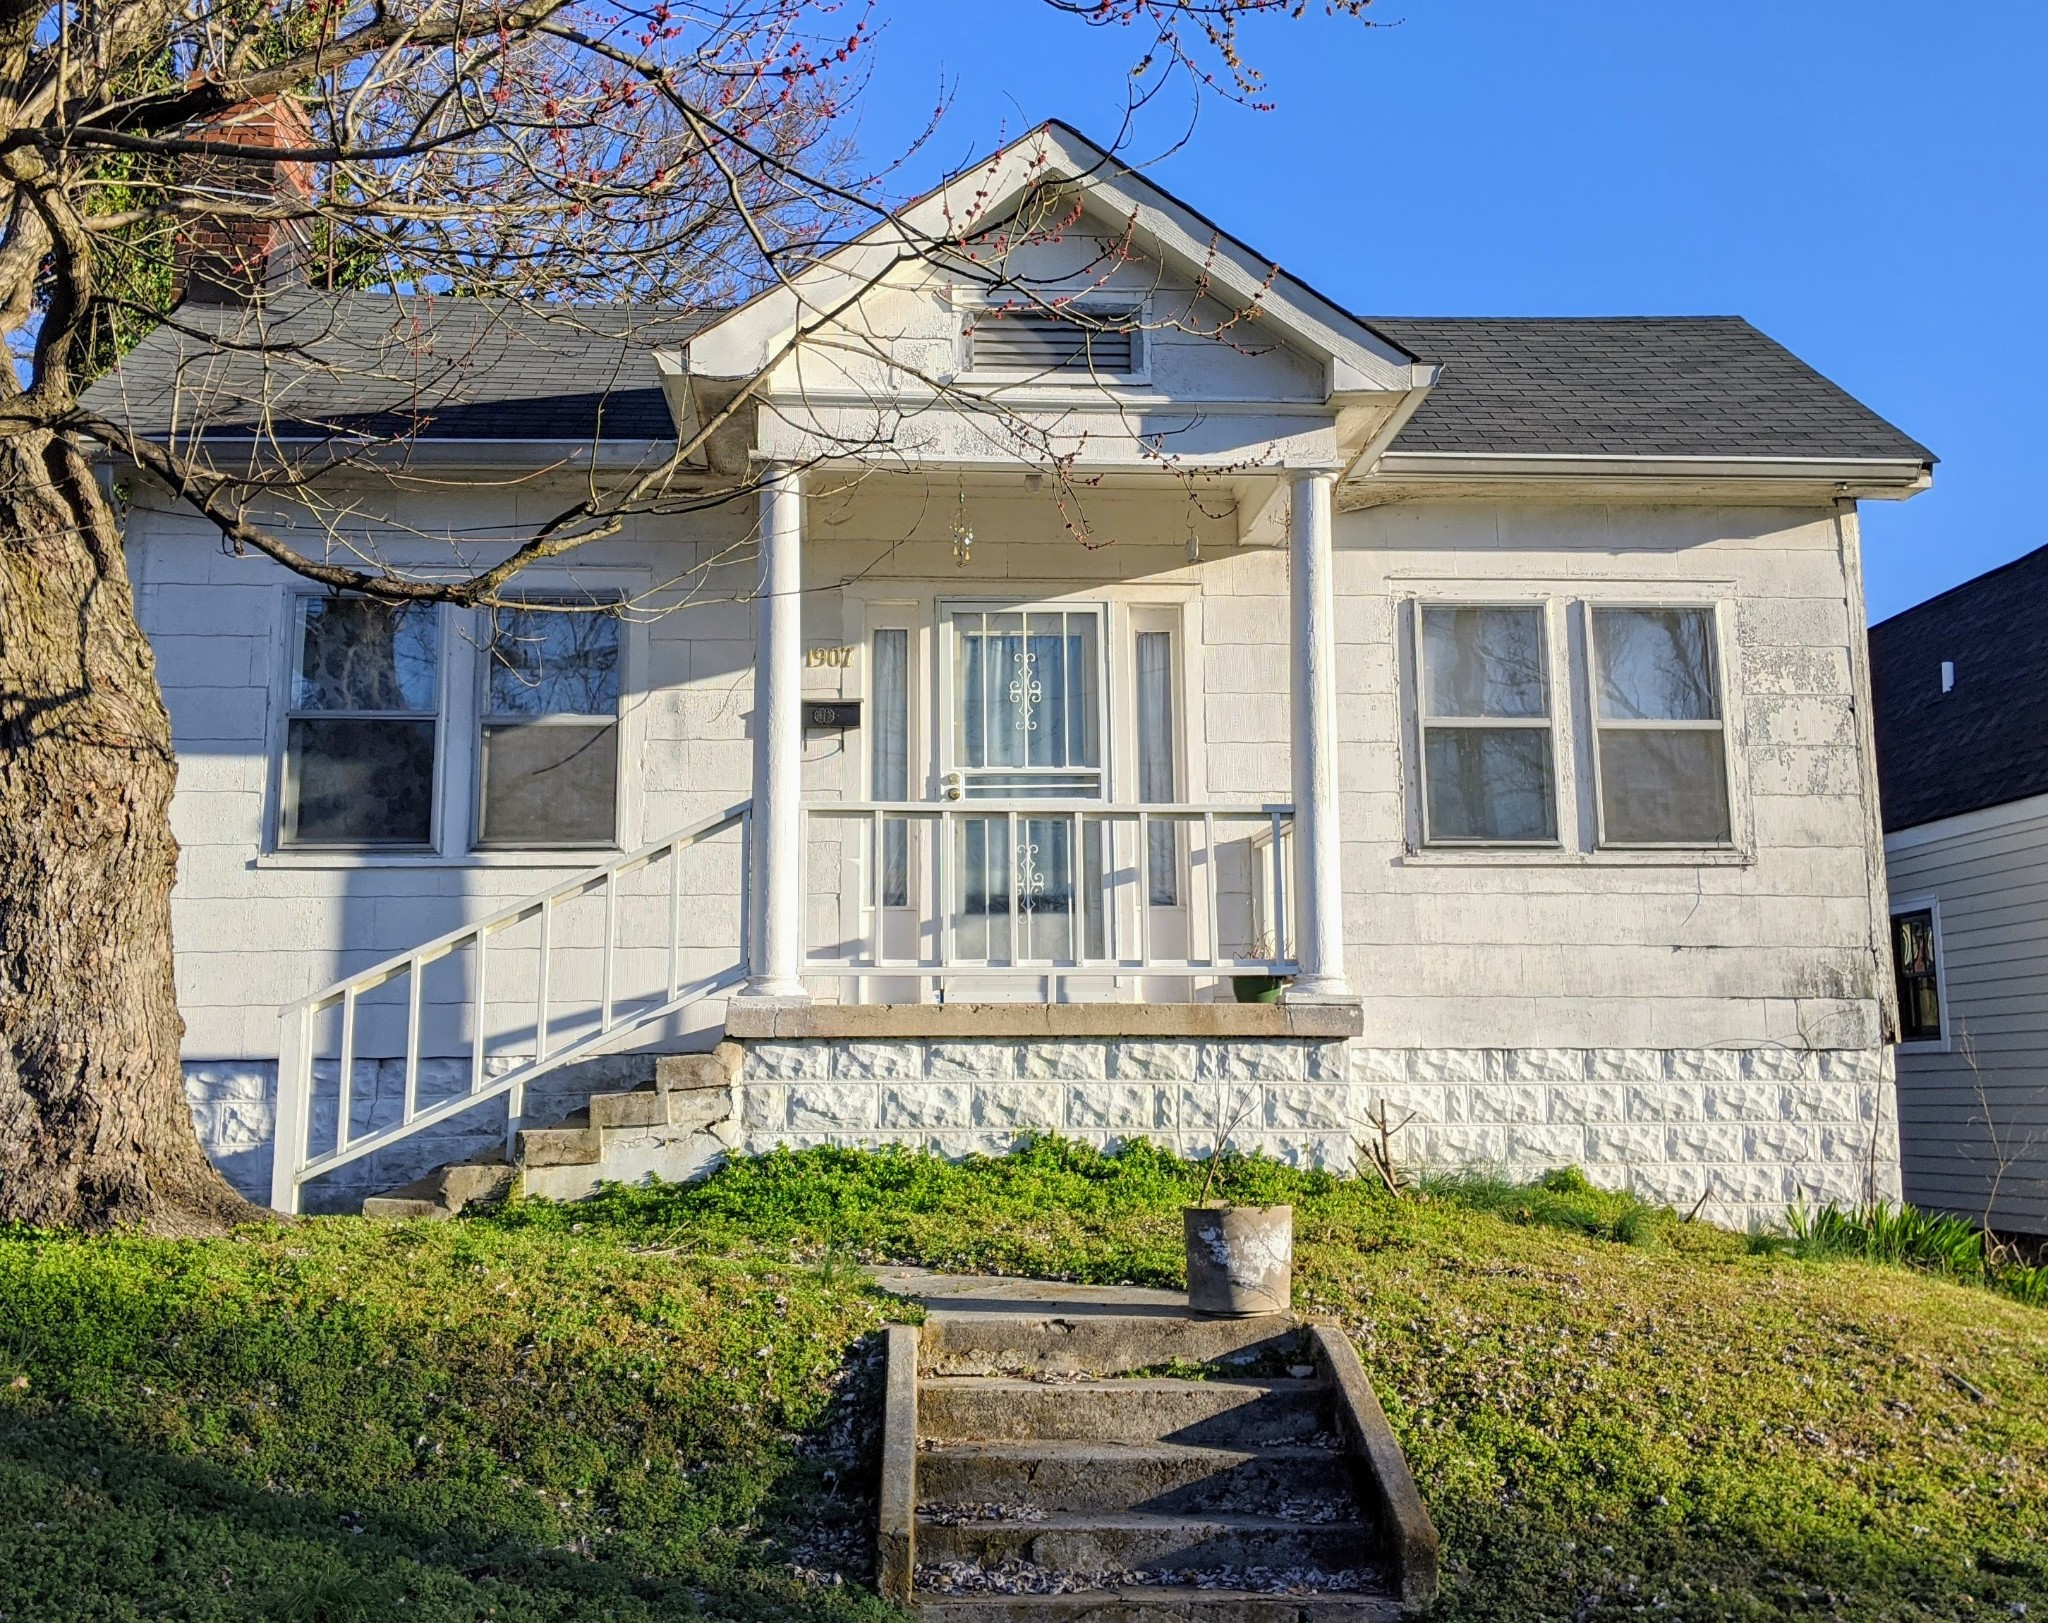 1907 Shelby Ave, Nashville, TN 37206 - Nashville, TN real estate listing